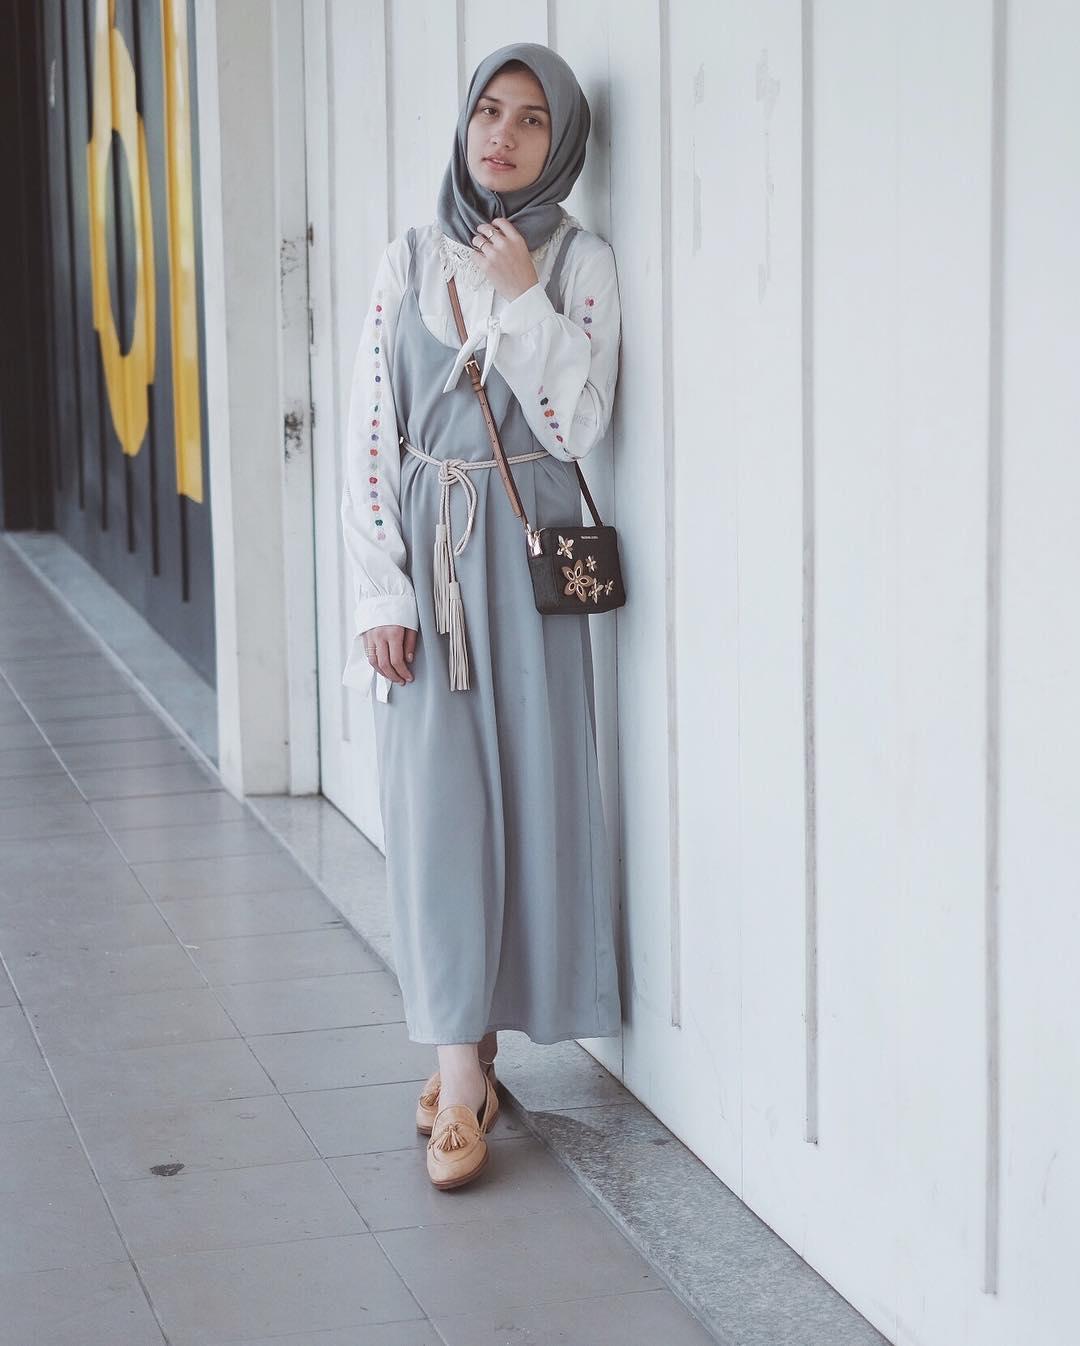 10 Style Hijab Kece Buat Cewek Bertubuh Kurus, Mau Tiru?